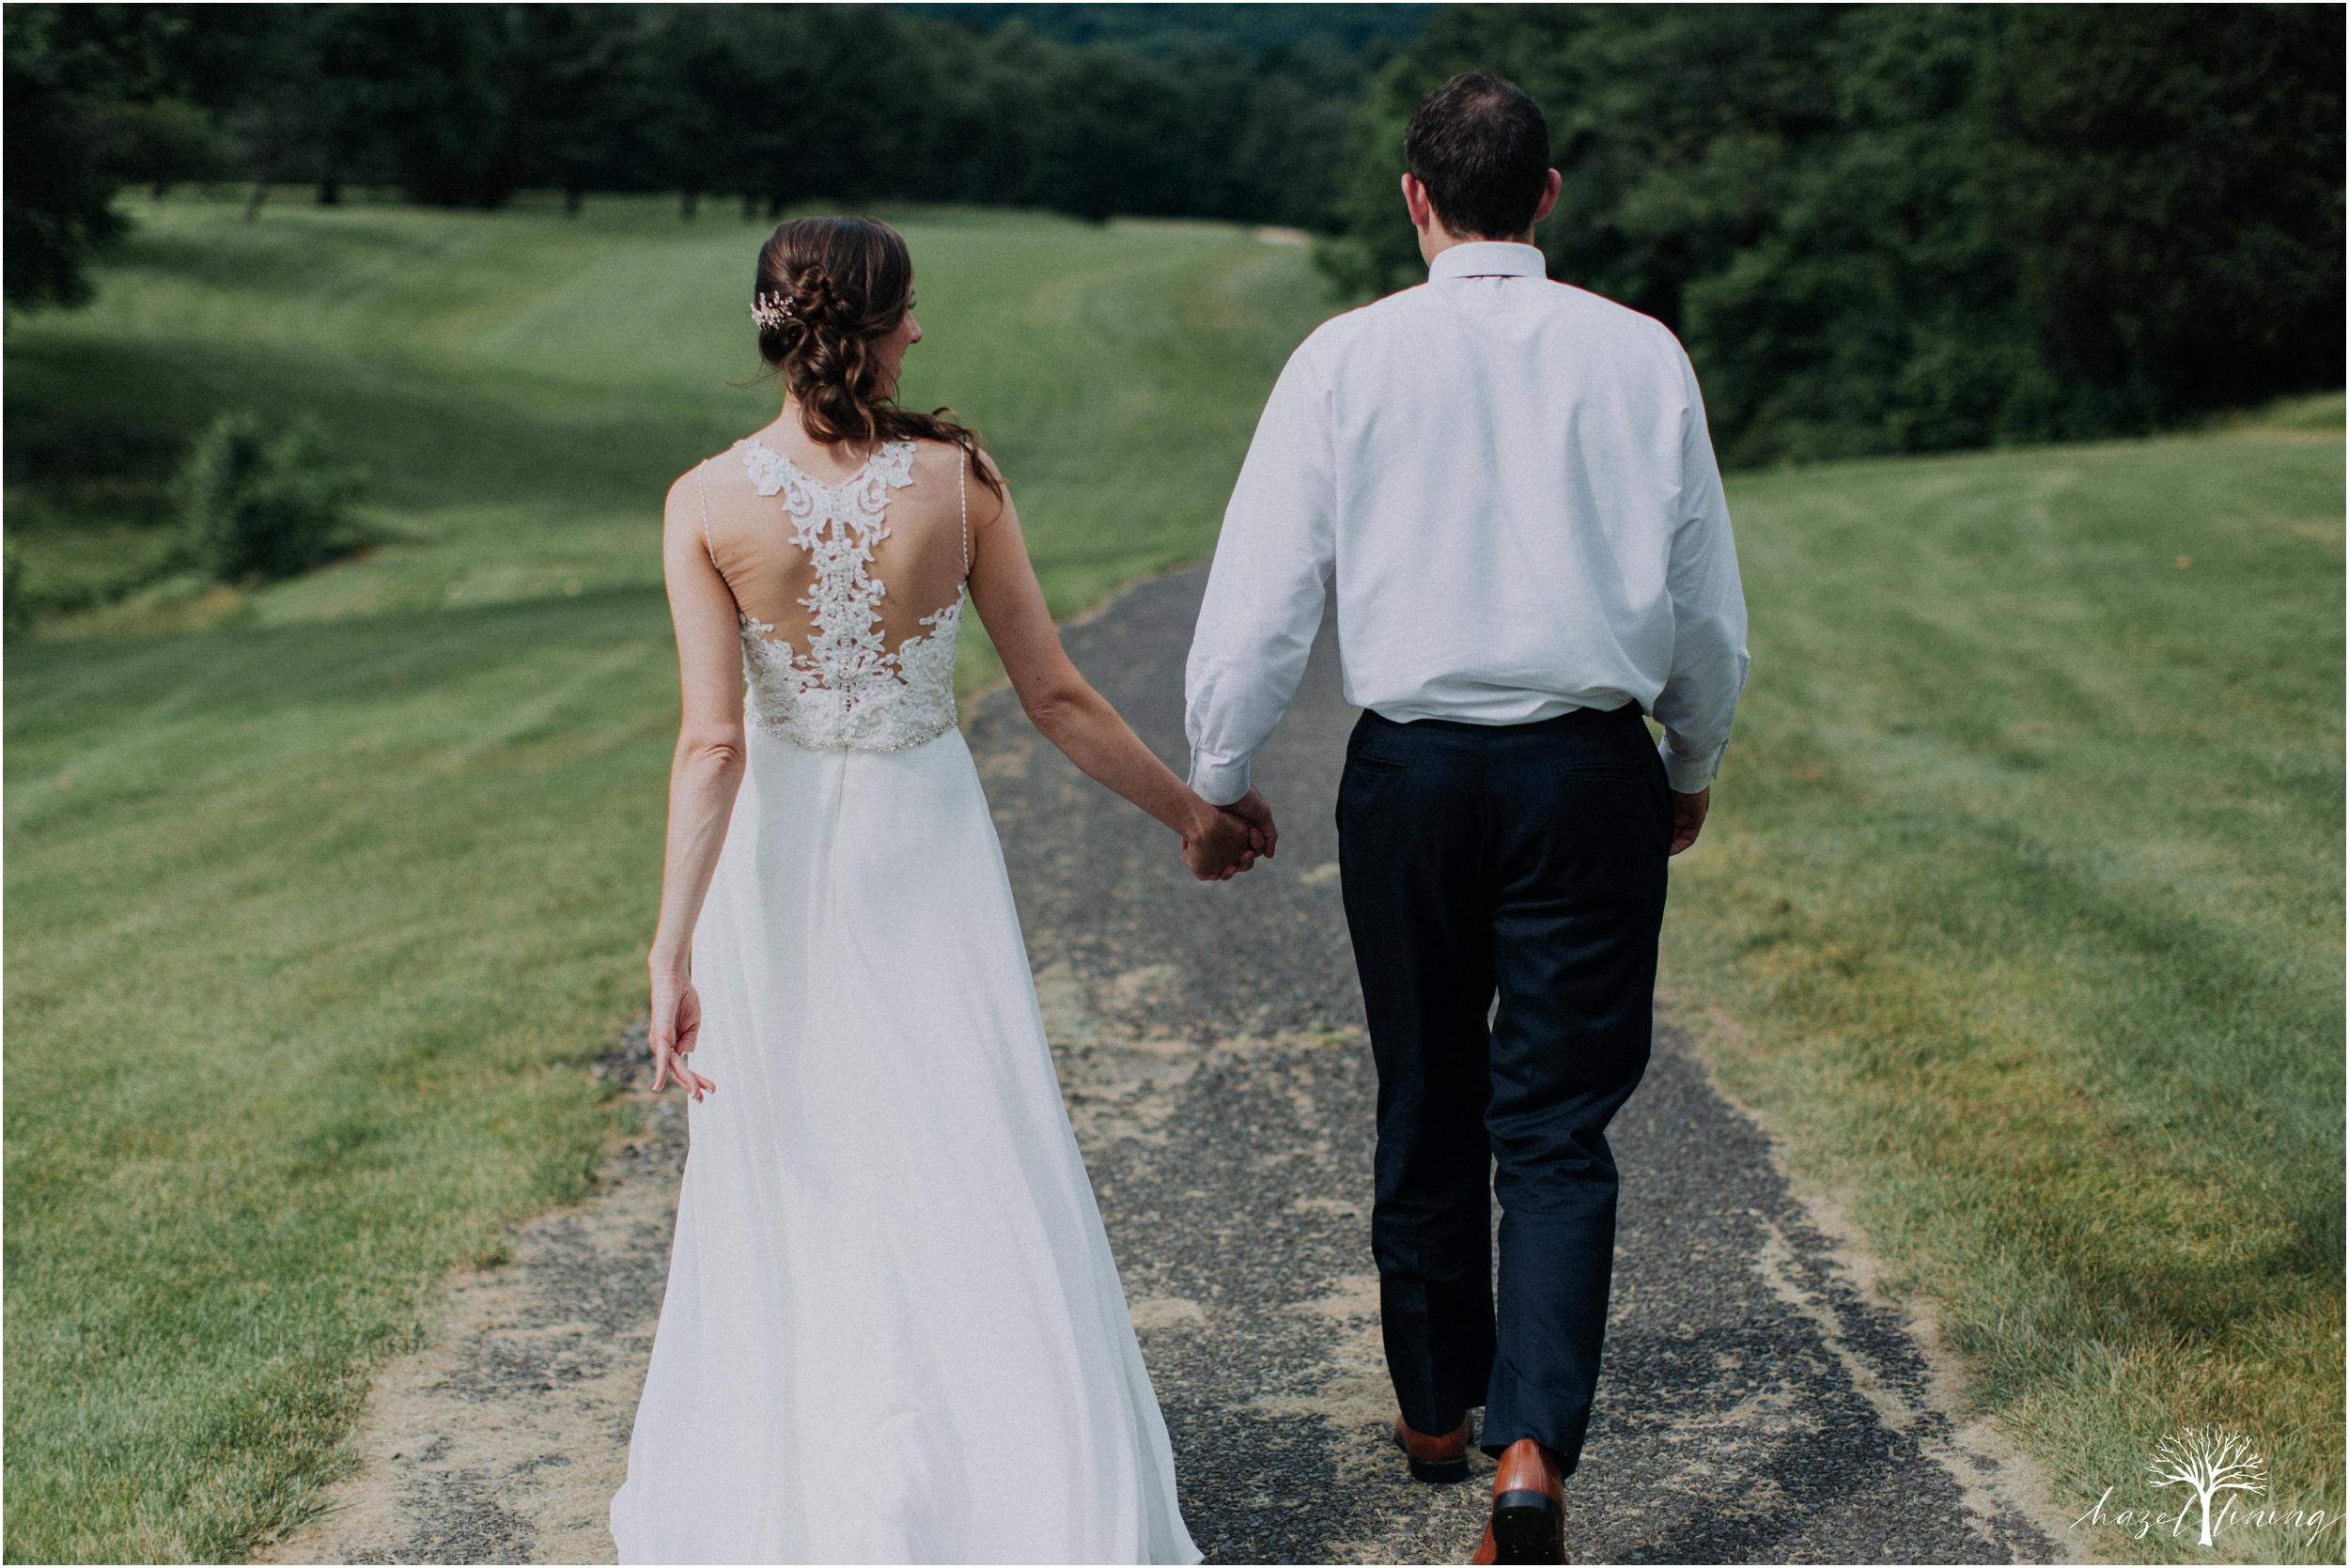 hazel-lining-travel-wedding-elopement-photography_0107.jpg